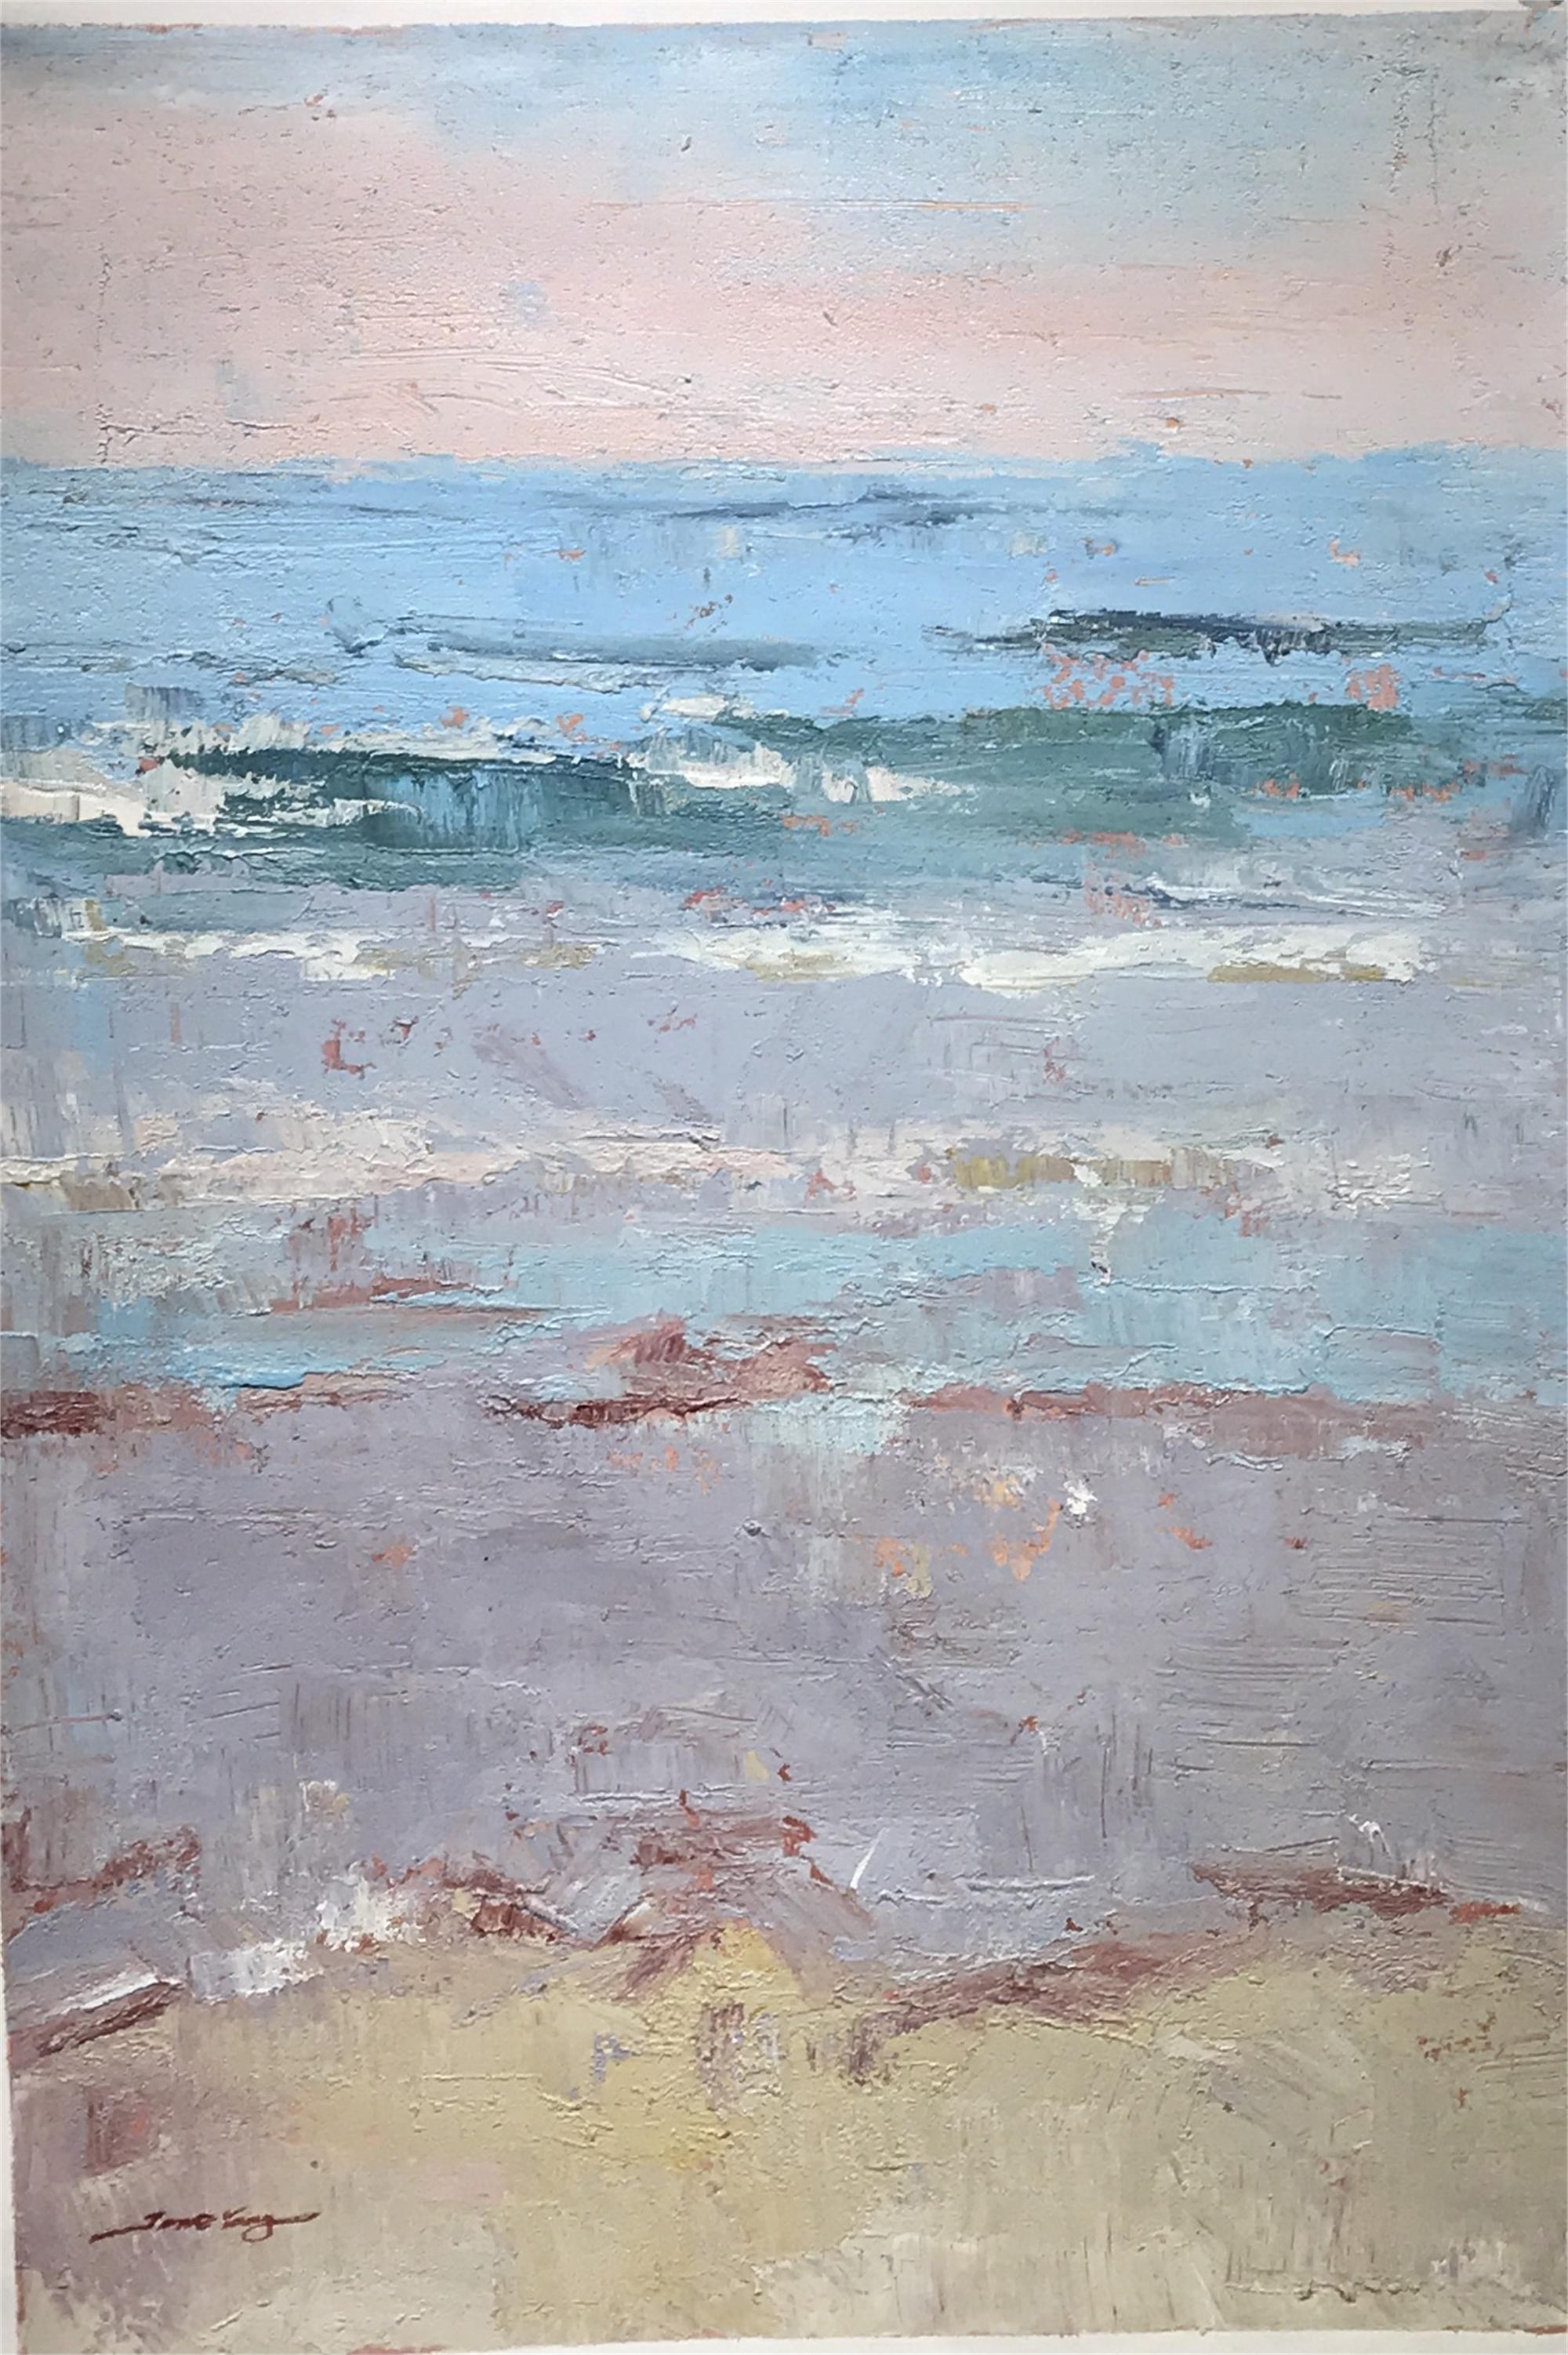 TEXTURED BEACH SCENE by YANG